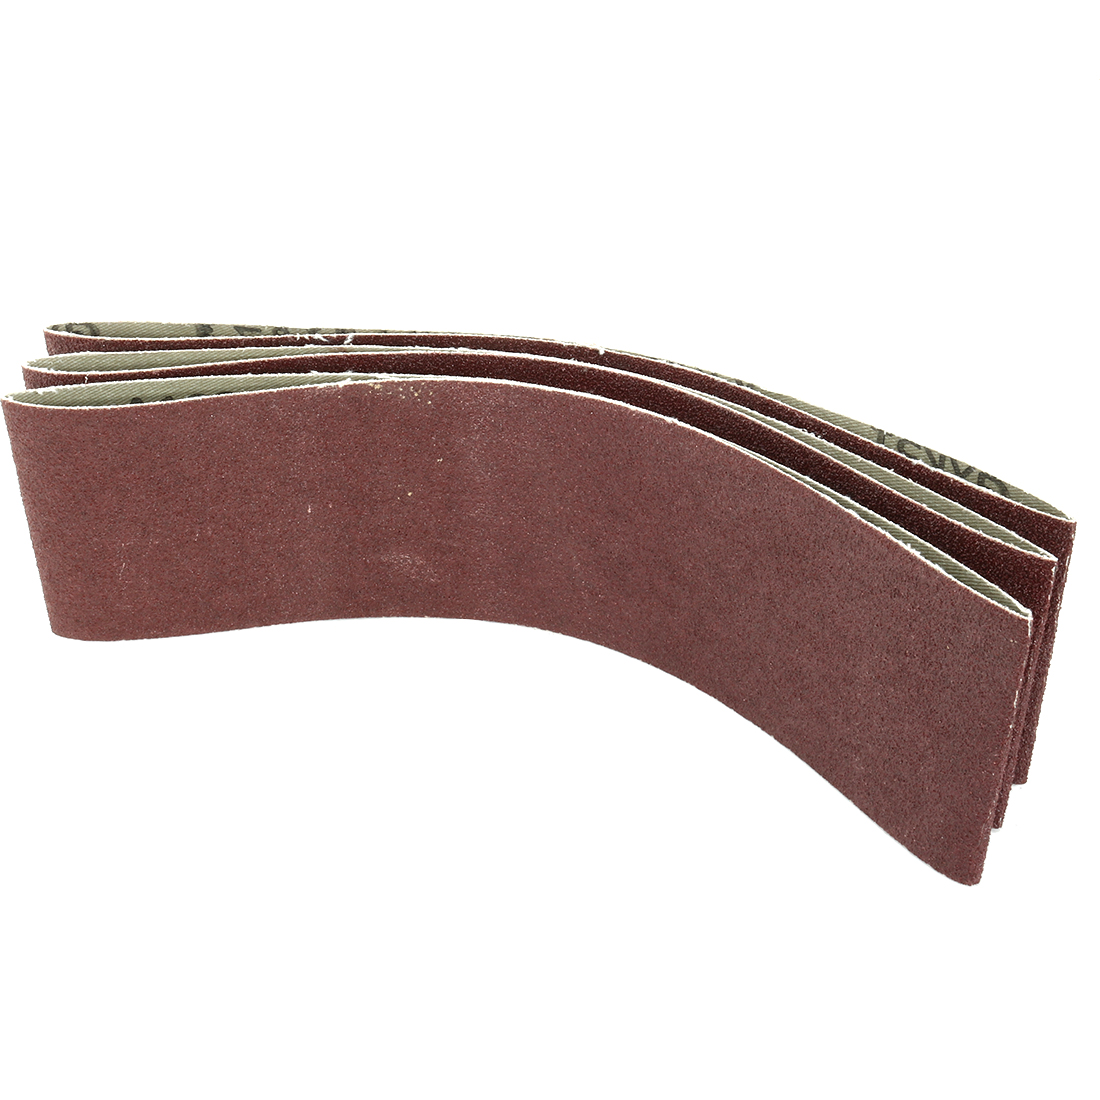 3-Inch x 21-Inch 100 Grit Lapped Butt Joint Aluminum Oxide Sanding Belt 3pcs - image 3 of 3